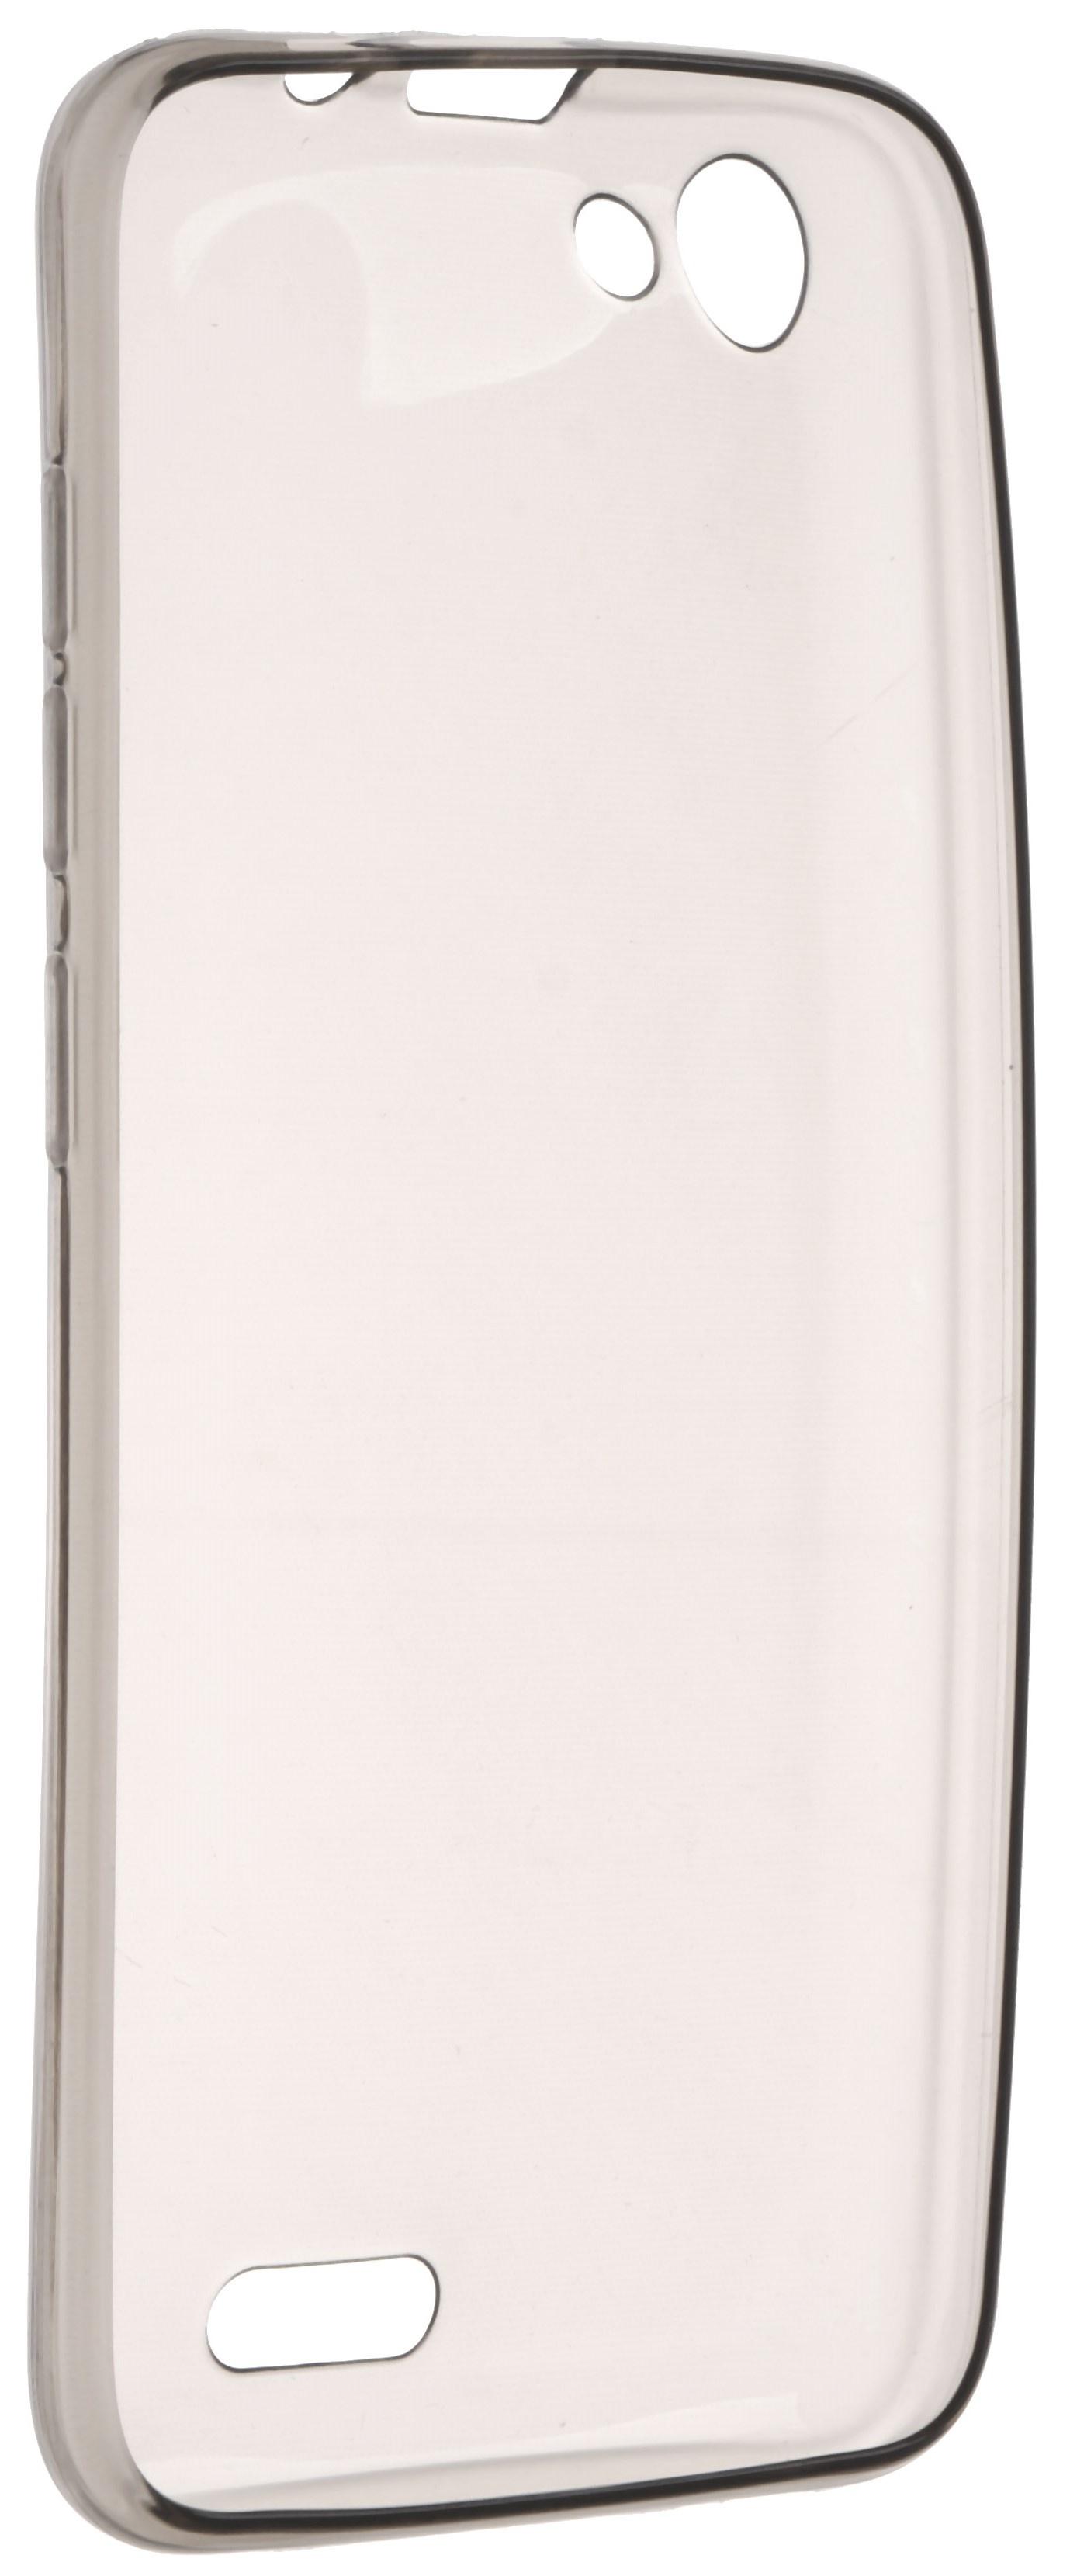 Чехол для сотового телефона skinBOX Slim Silicone, 4630042521605, серый